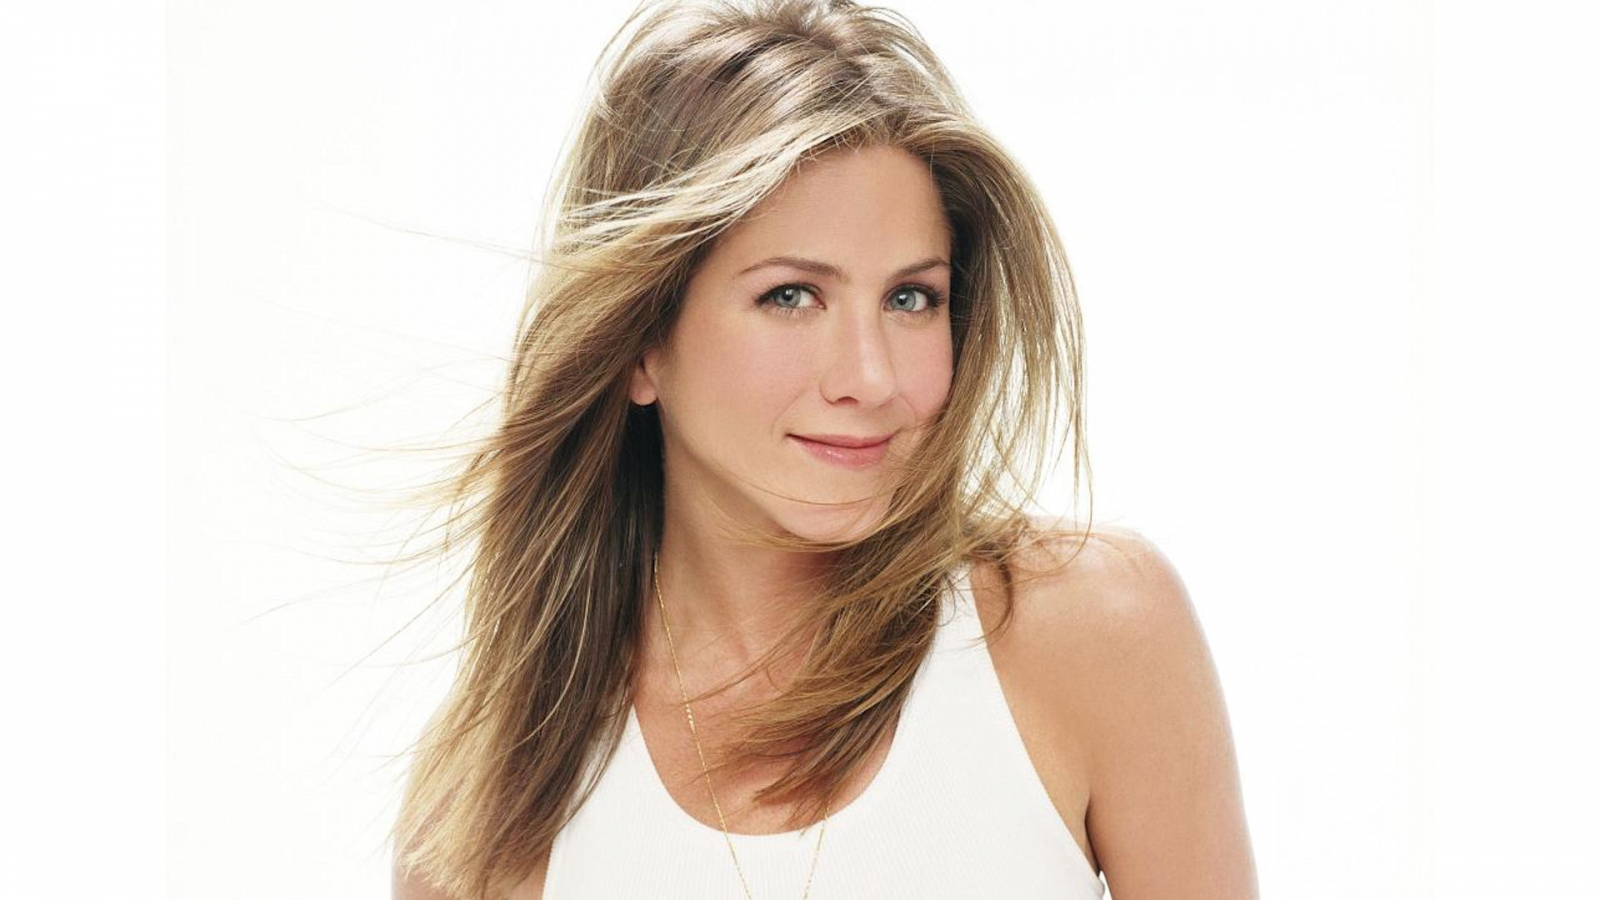 Jennifer Aniston 2013 - 1600x900